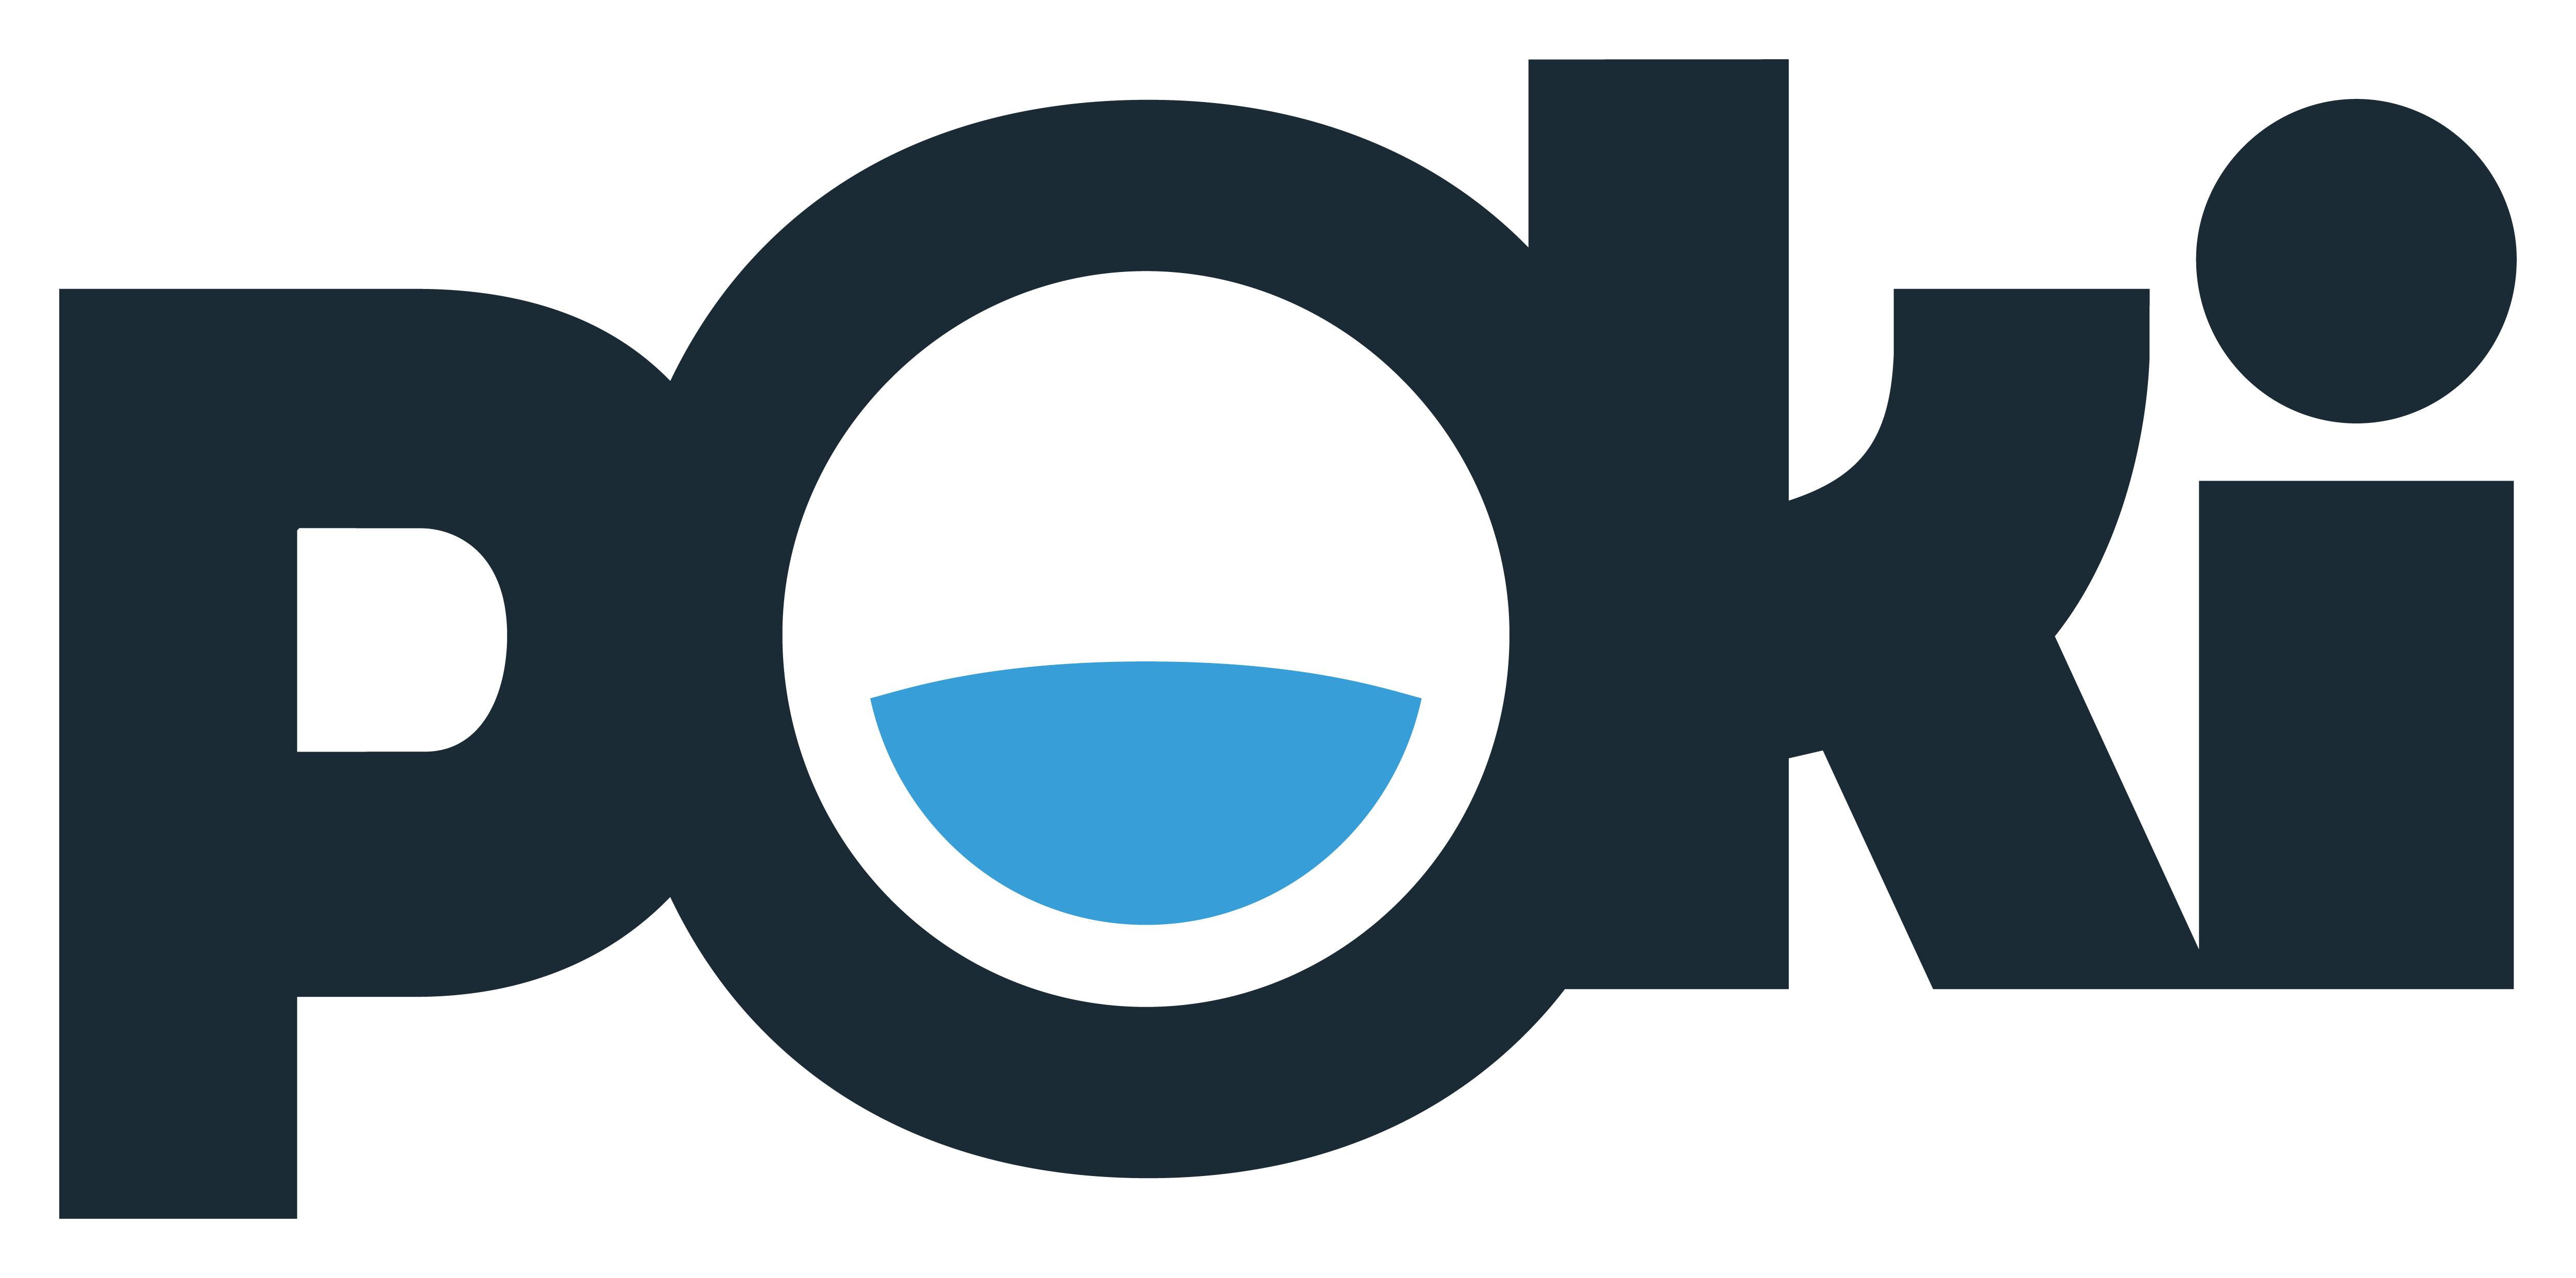 poki.com